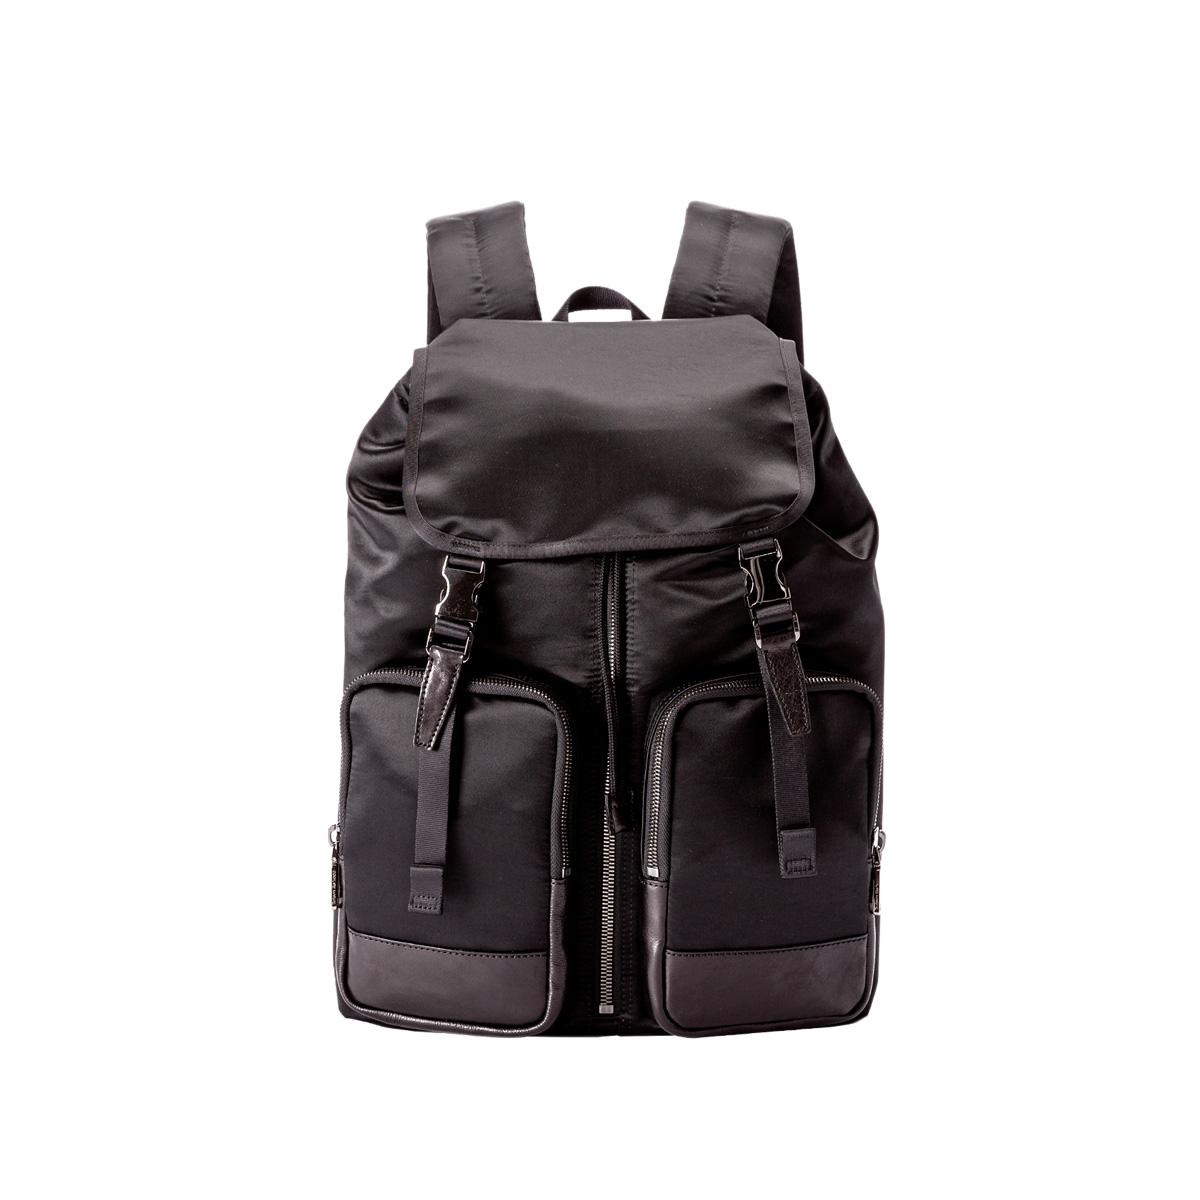 Totem Re Vooo TWINKLE トーテムリボー リュック バッグ バックパック メンズ 豊岡鞄 ブラック ネイビー 黒 TRV0802